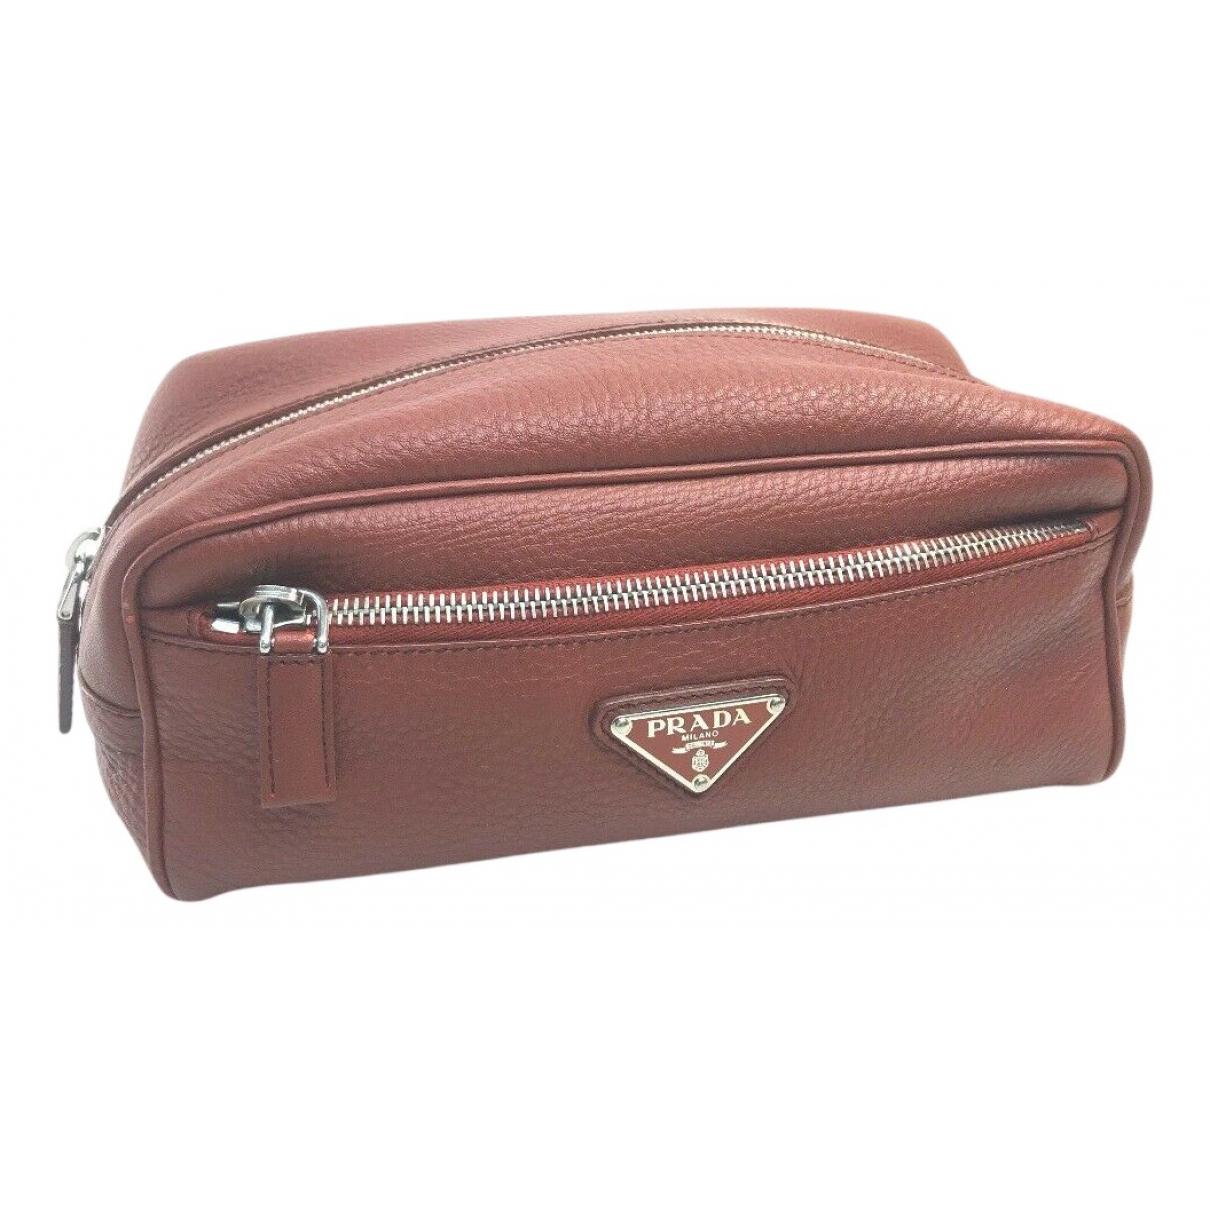 Prada N Burgundy Leather Travel bag for Women N